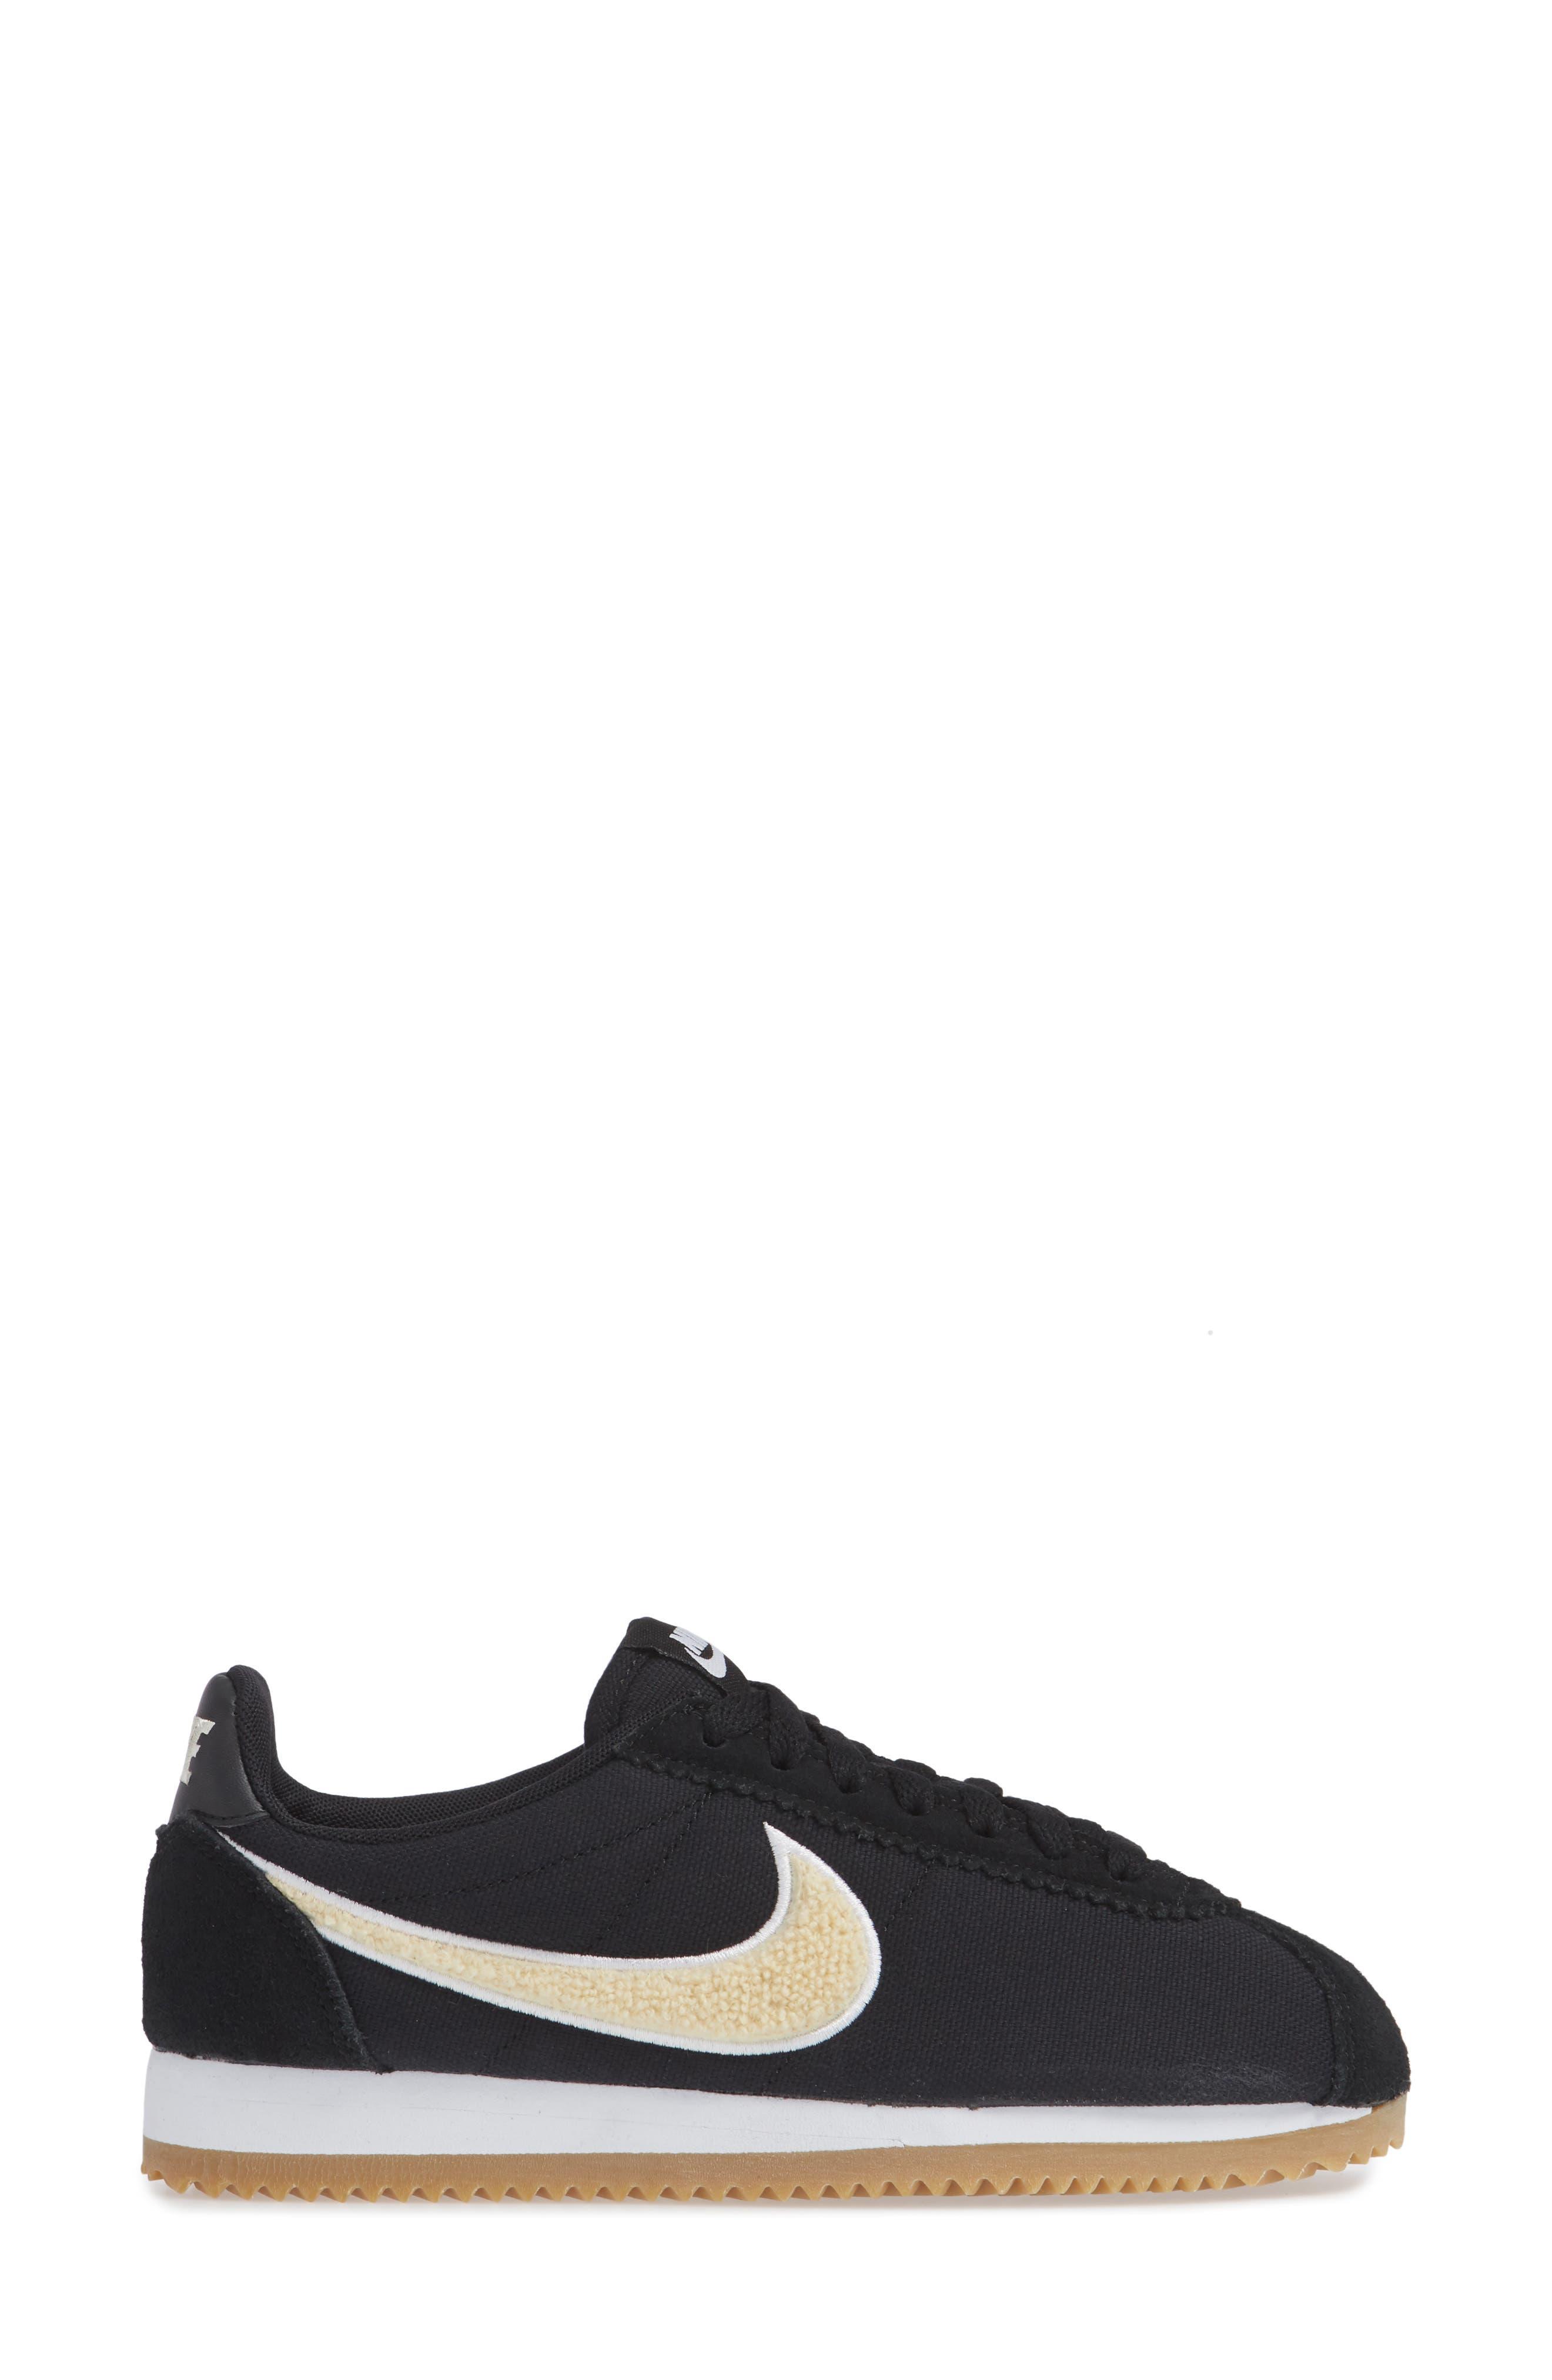 Classic Cortez Premium XLV Sneaker,                             Alternate thumbnail 6, color,                             Black/ Light Cream/ Brown